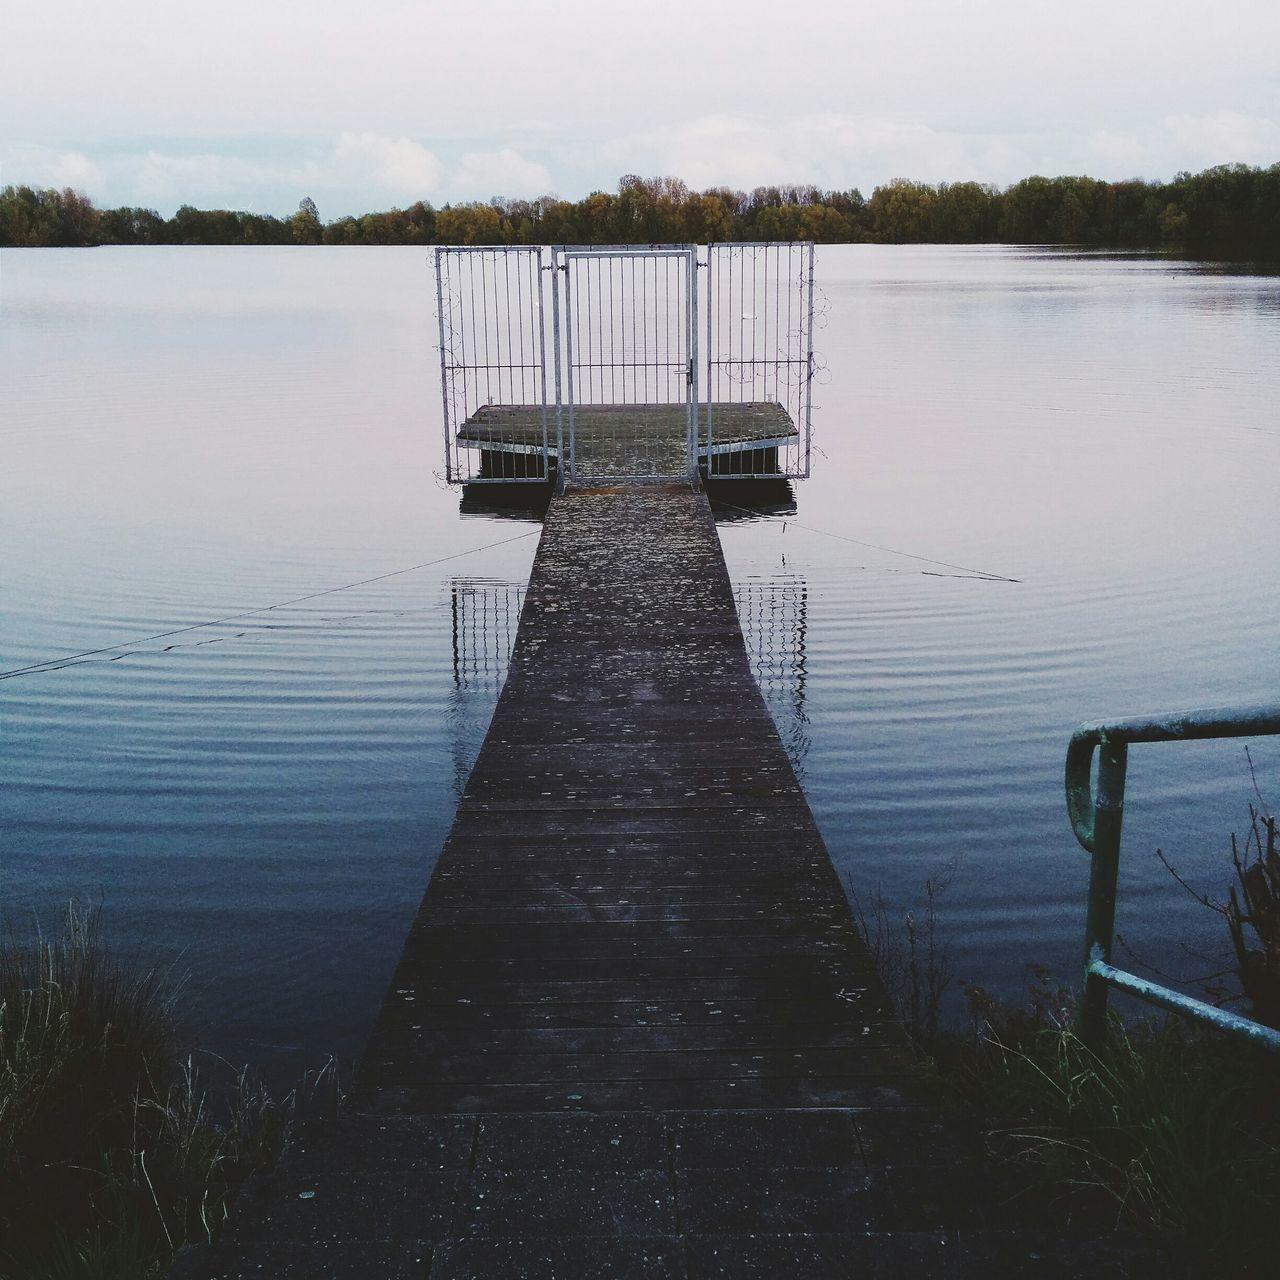 Taking Photos Relaxing Enjoying Life Popular Photos Wisseler See Landscape Water Sea And Sky Door Mystery